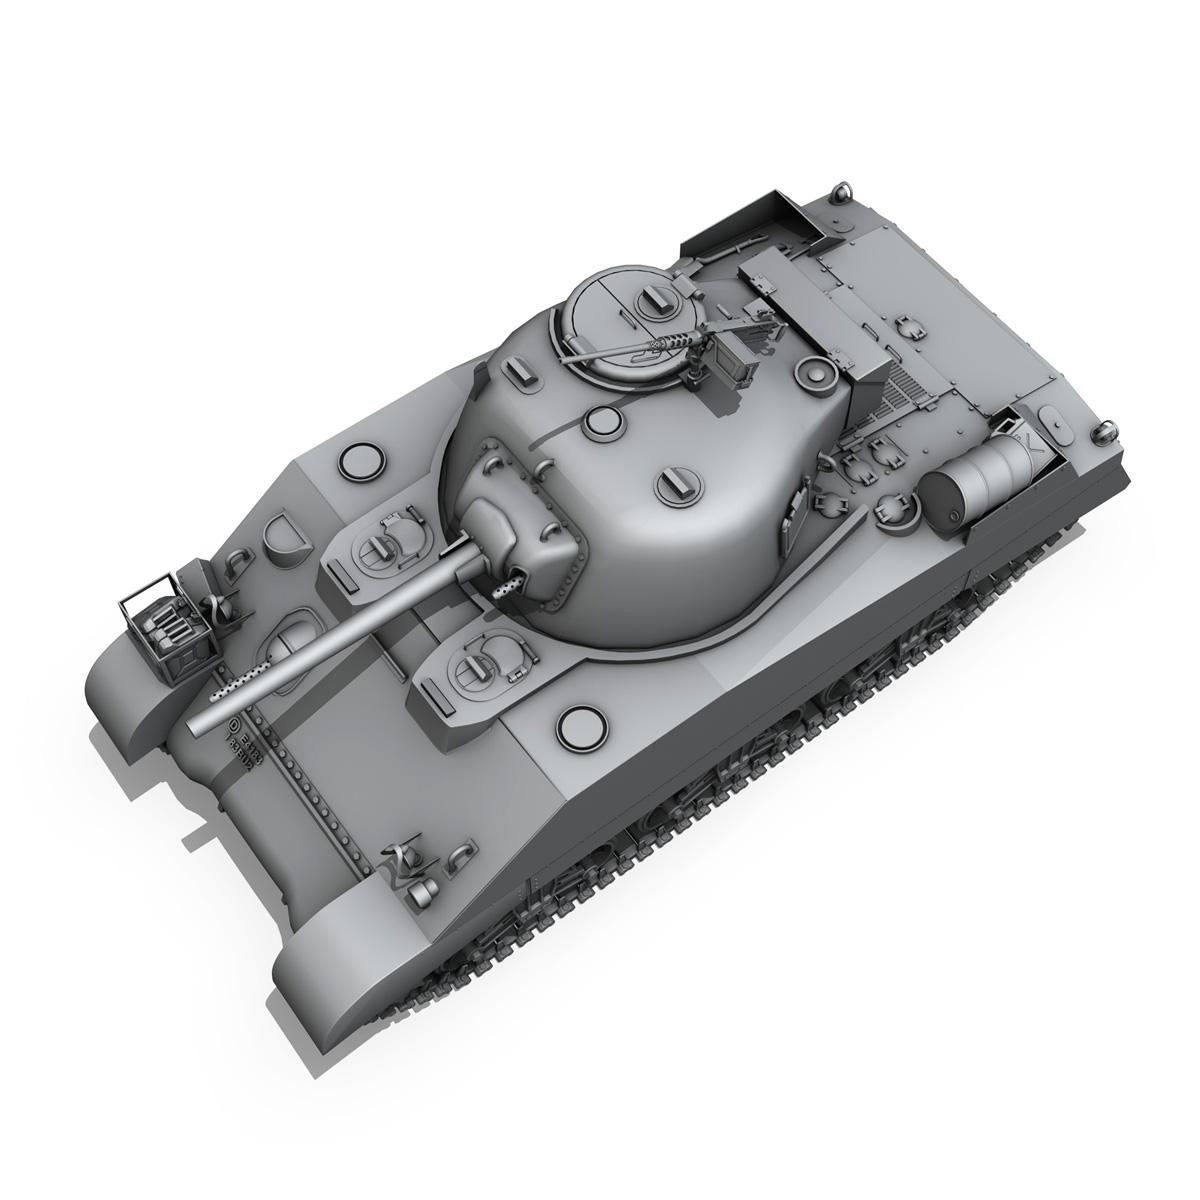 m4 sherman mk iii - britu armija 3d modelis 3ds fbx c4d lwo obj 201971